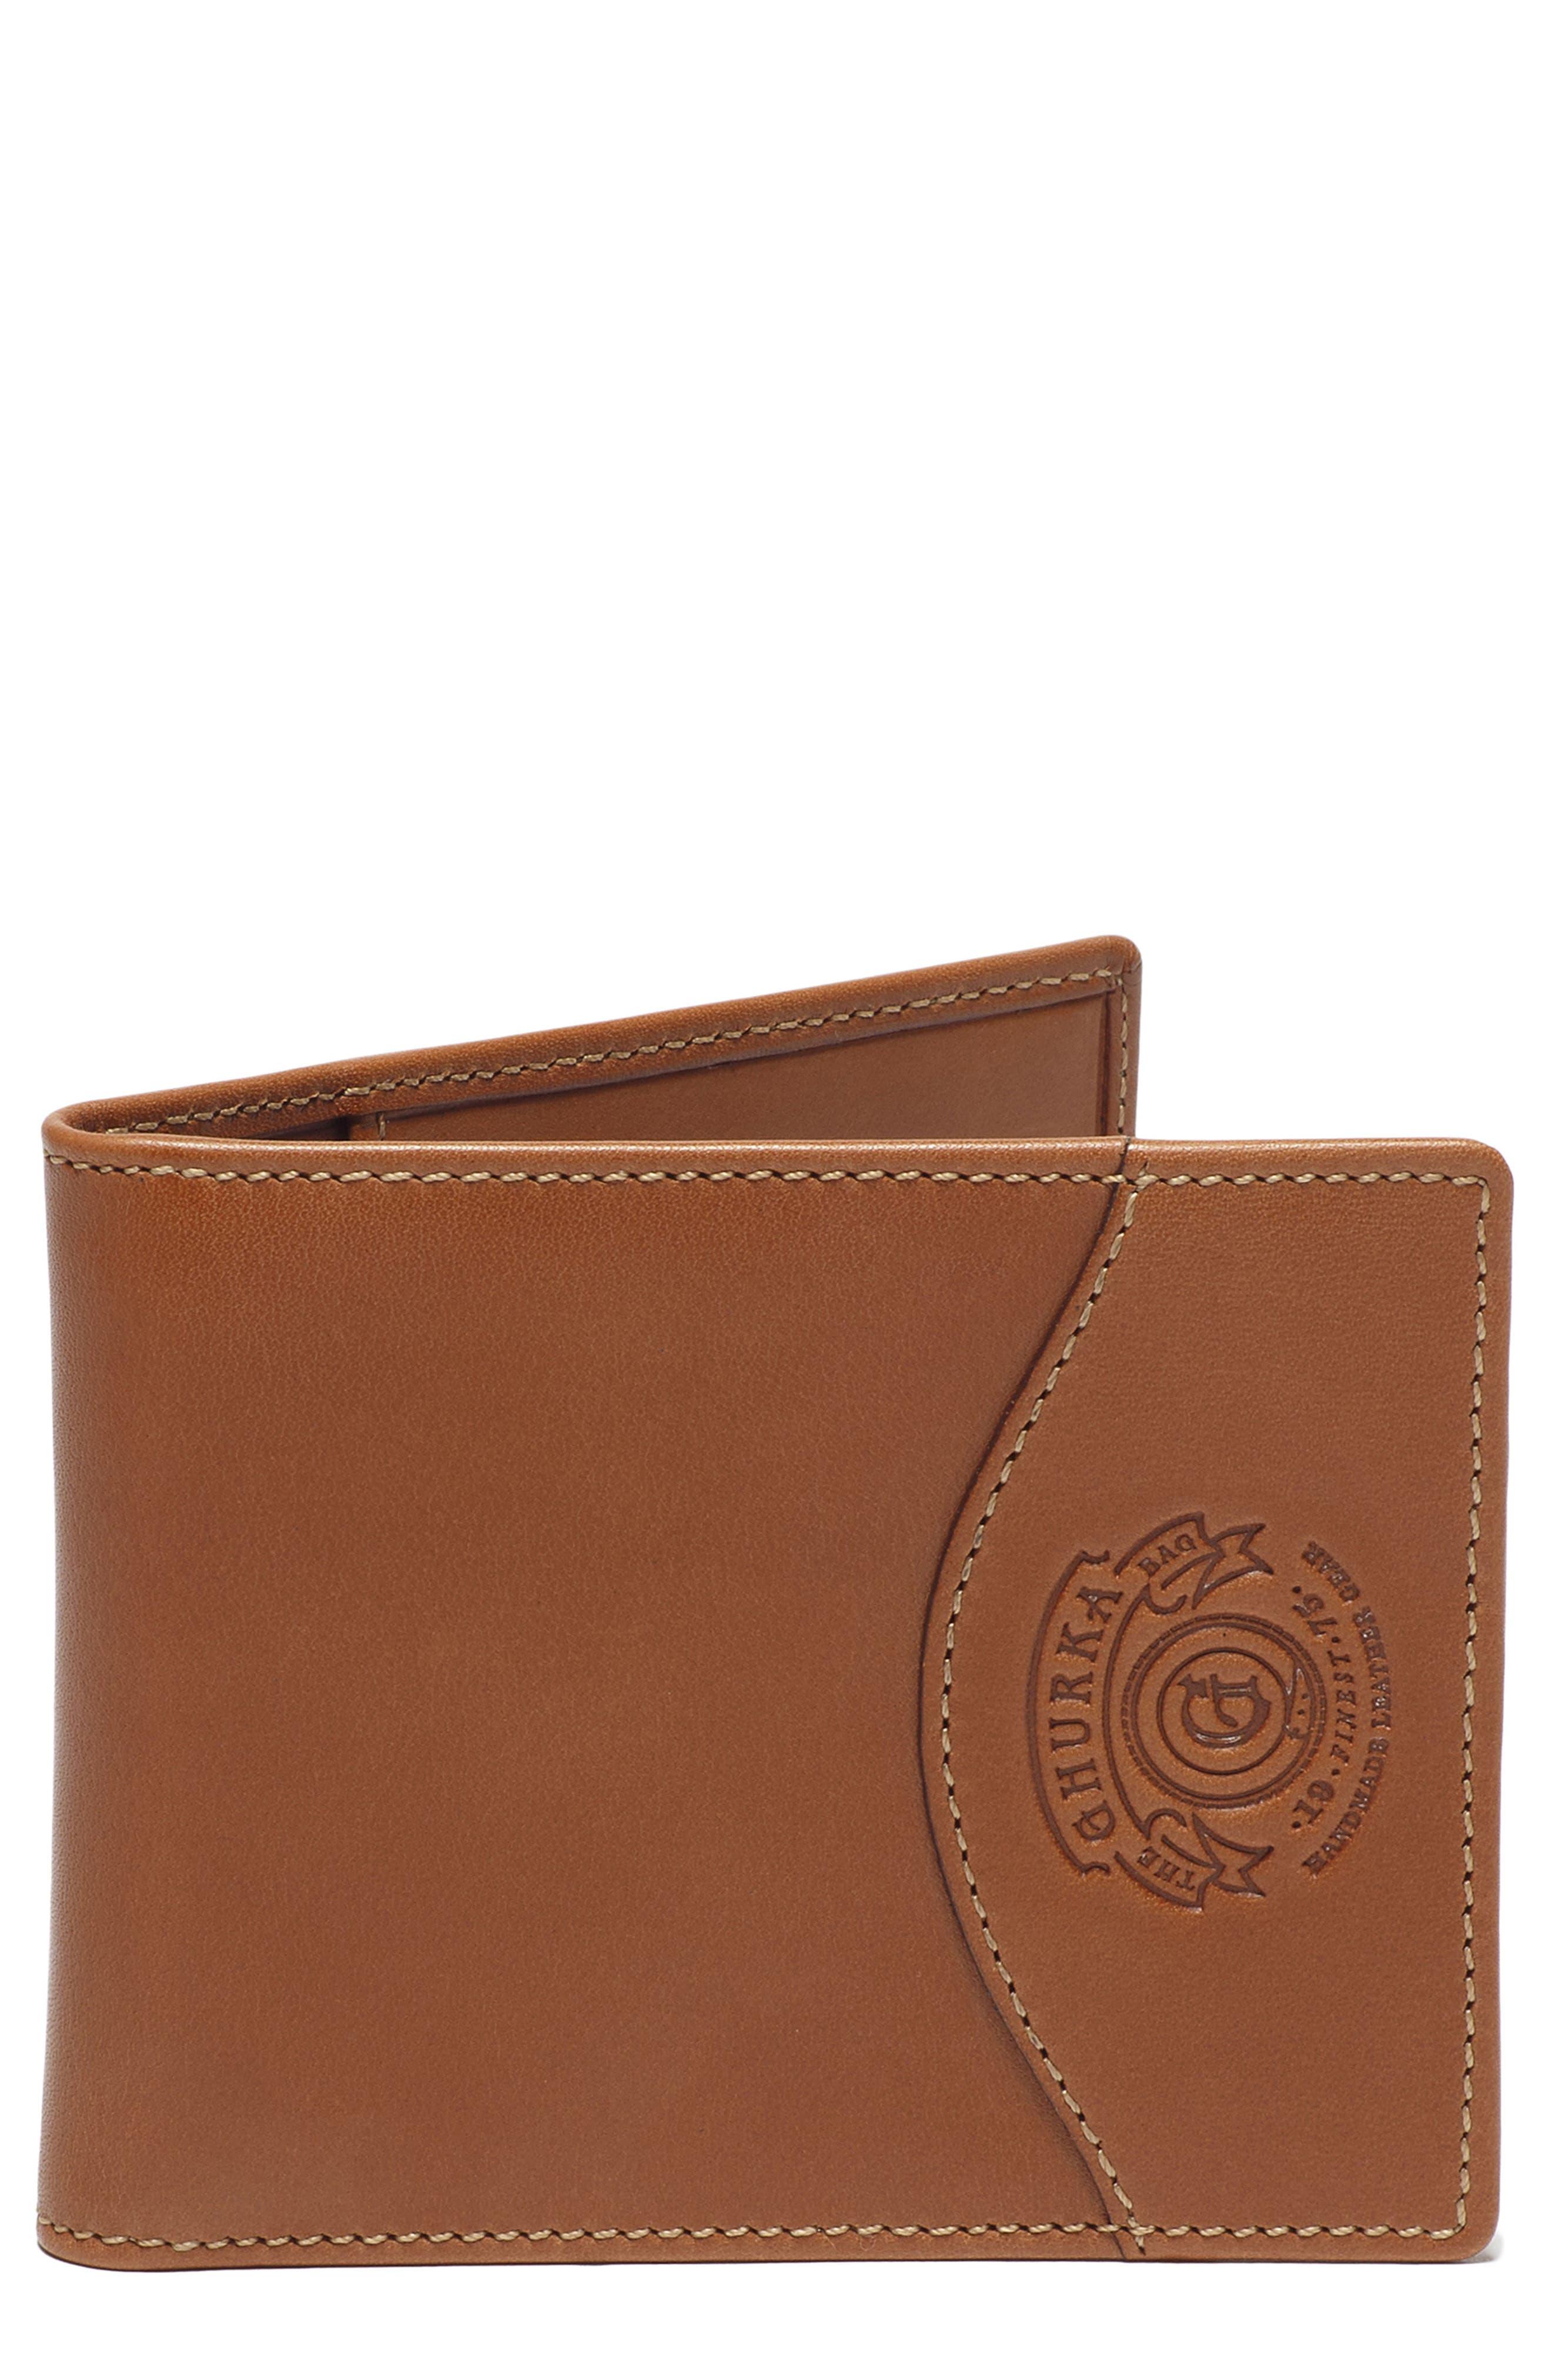 Ghurka Leather Money Clip Wallet